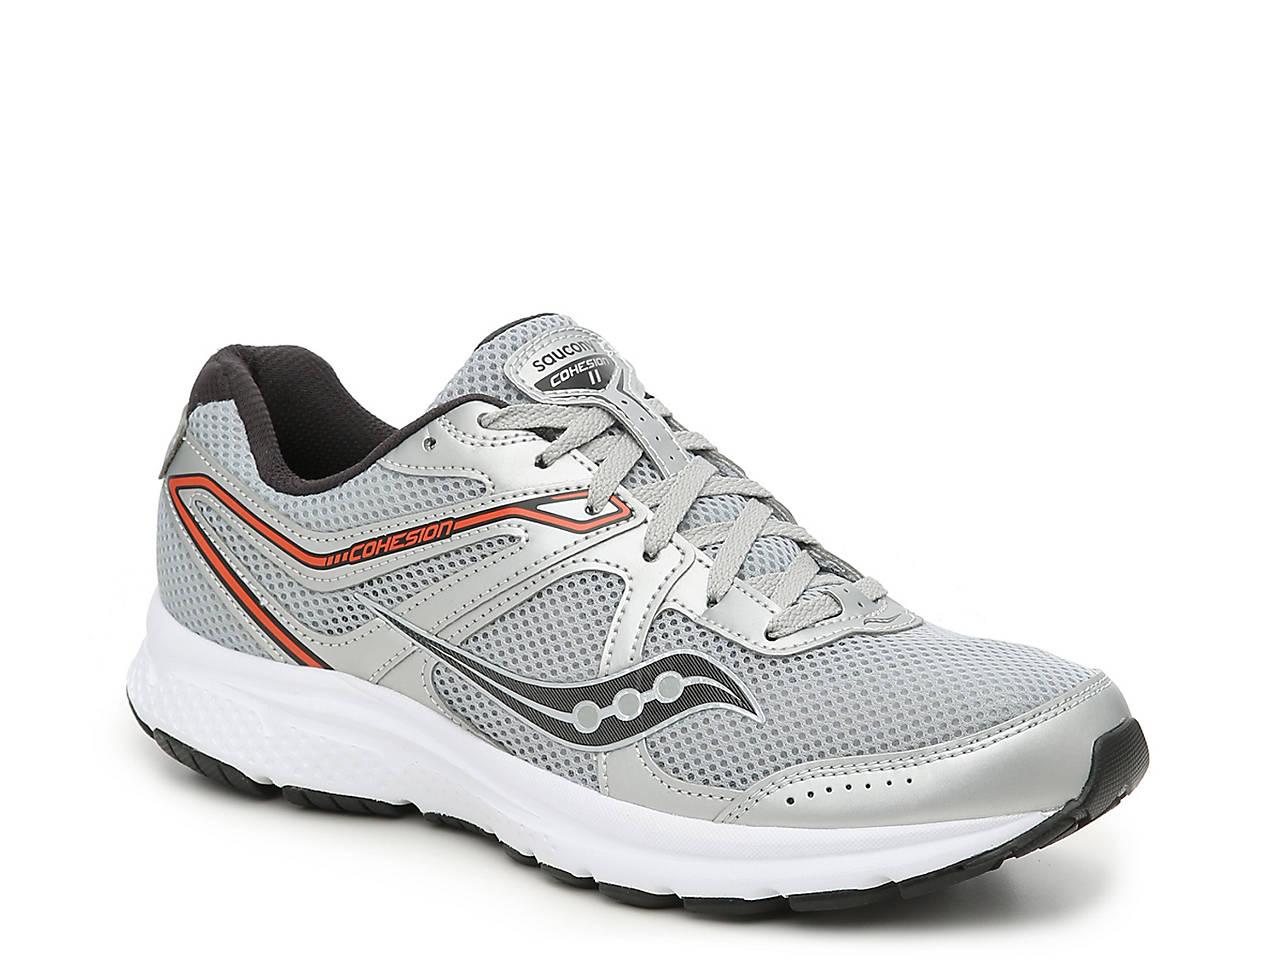 Grid Cohesion 11 Running Shoe Men's